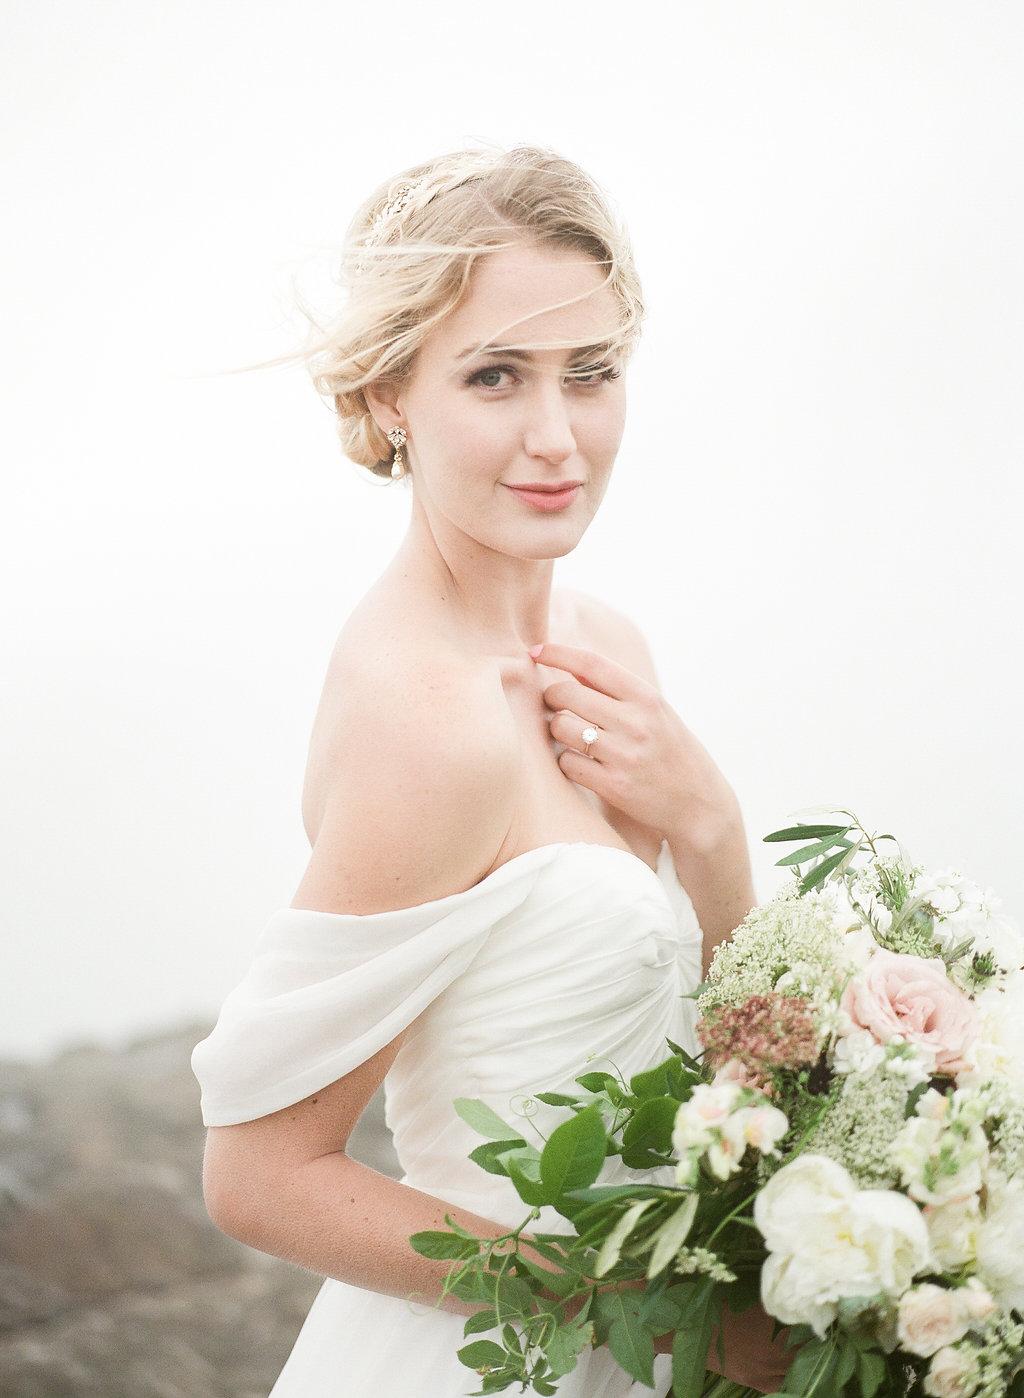 josie-photographs-urban-petals-mountain-wedding-north-carolina-mountain-wedding-ivory-and-beau-bridal-boutique-savannah-wedding-dresses-savannah-bridal-boutique-savannah-wedding-gowns-sarah-seven-lafayette-sarah-seven-wedding-dress-boho-bride-24.jpg